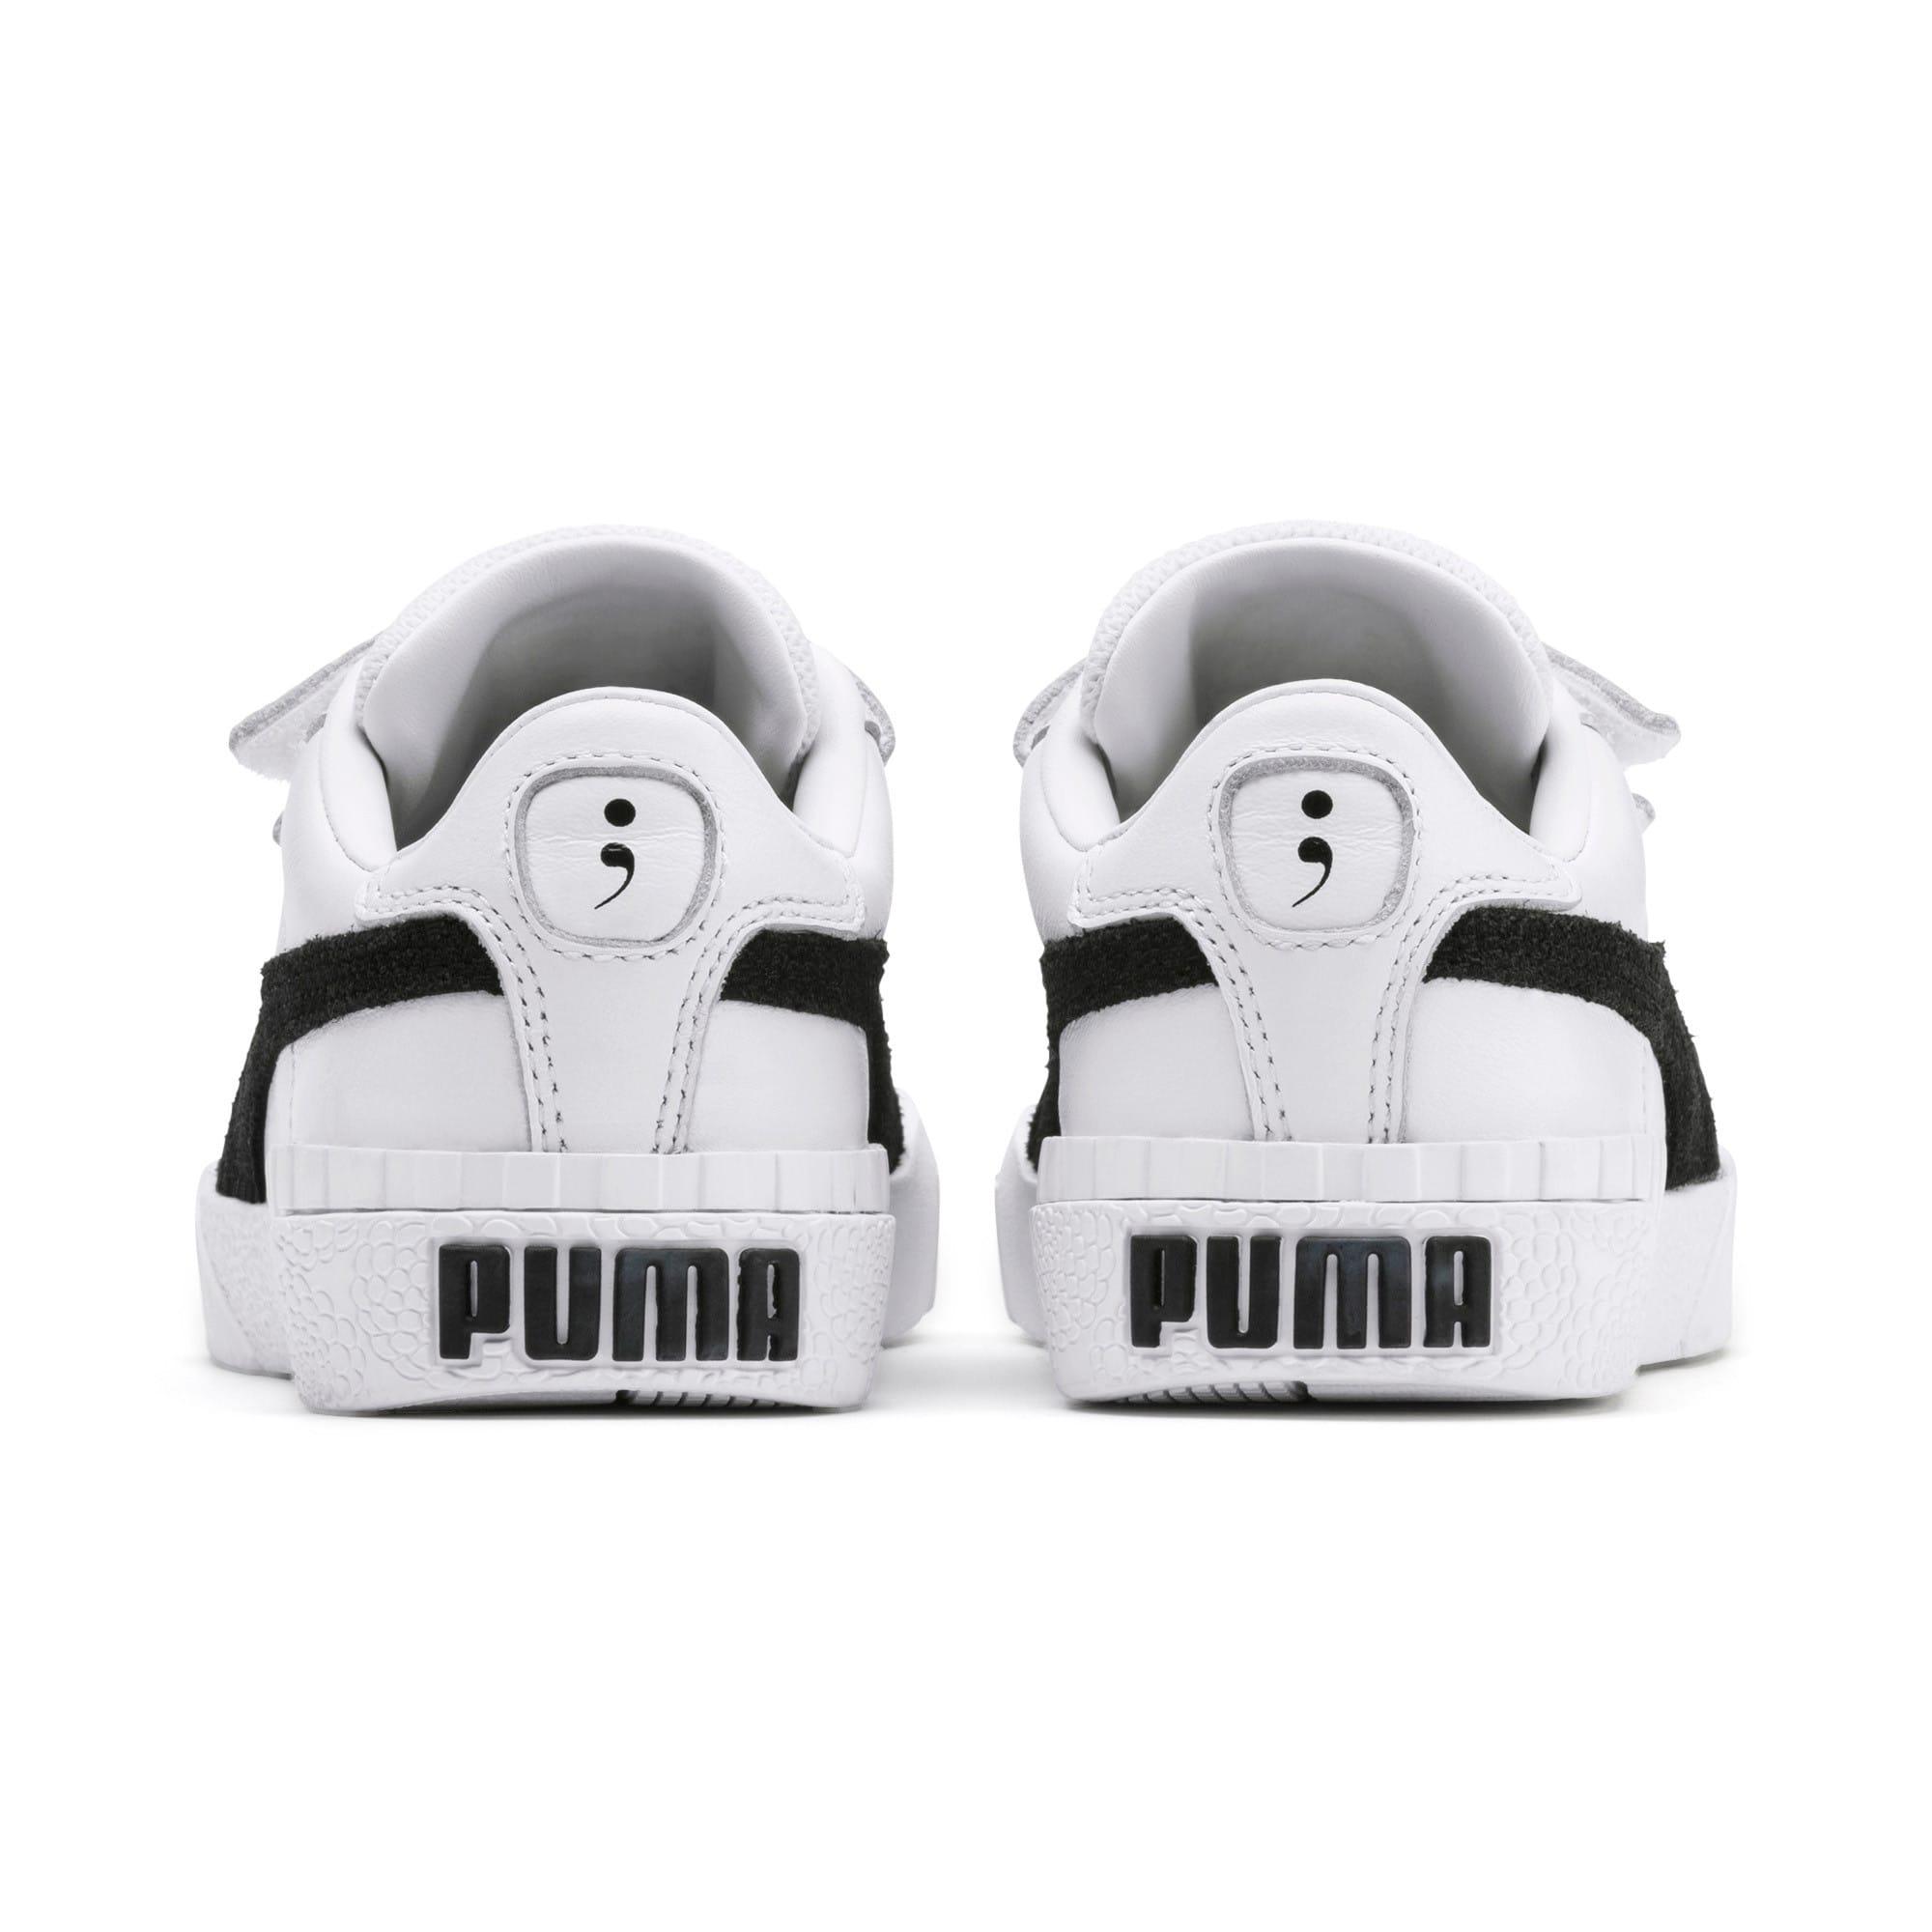 Thumbnail 3 of キッズ ガールズ SG x PUMA CALI V B&W PS スニーカー 17-21cm, Puma White-Puma Black, medium-JPN